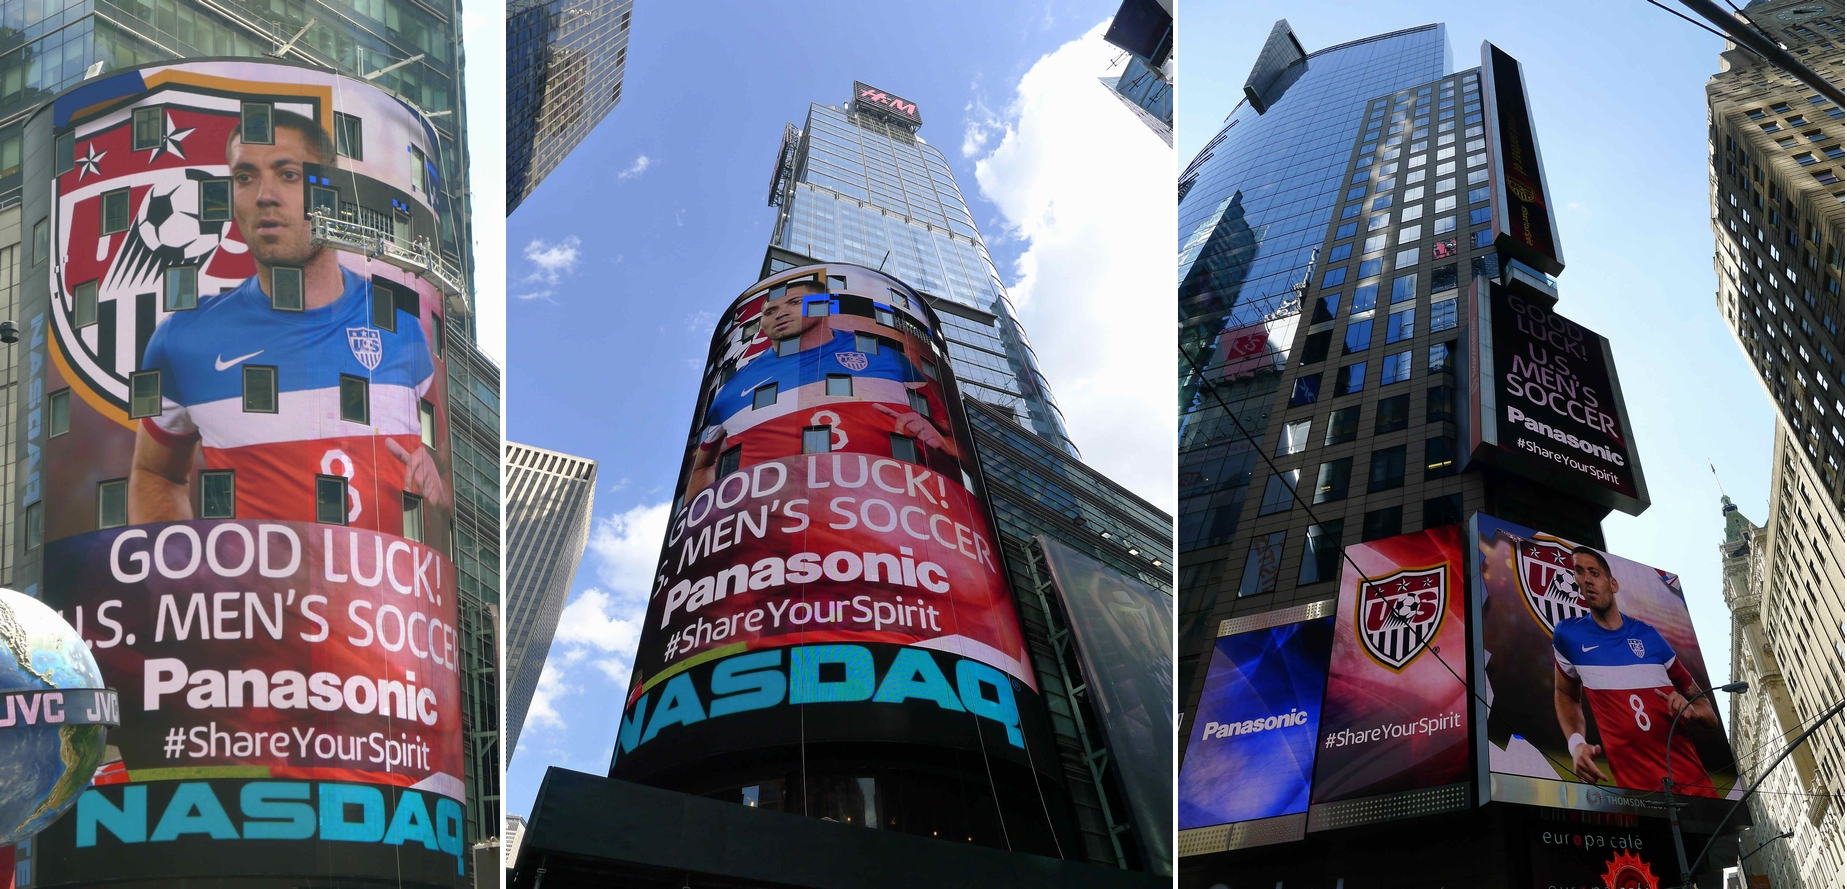 NYタイムズスクエアで開催 USサッカーチーム壮行イベントでパナソニックAVソリューションが活躍